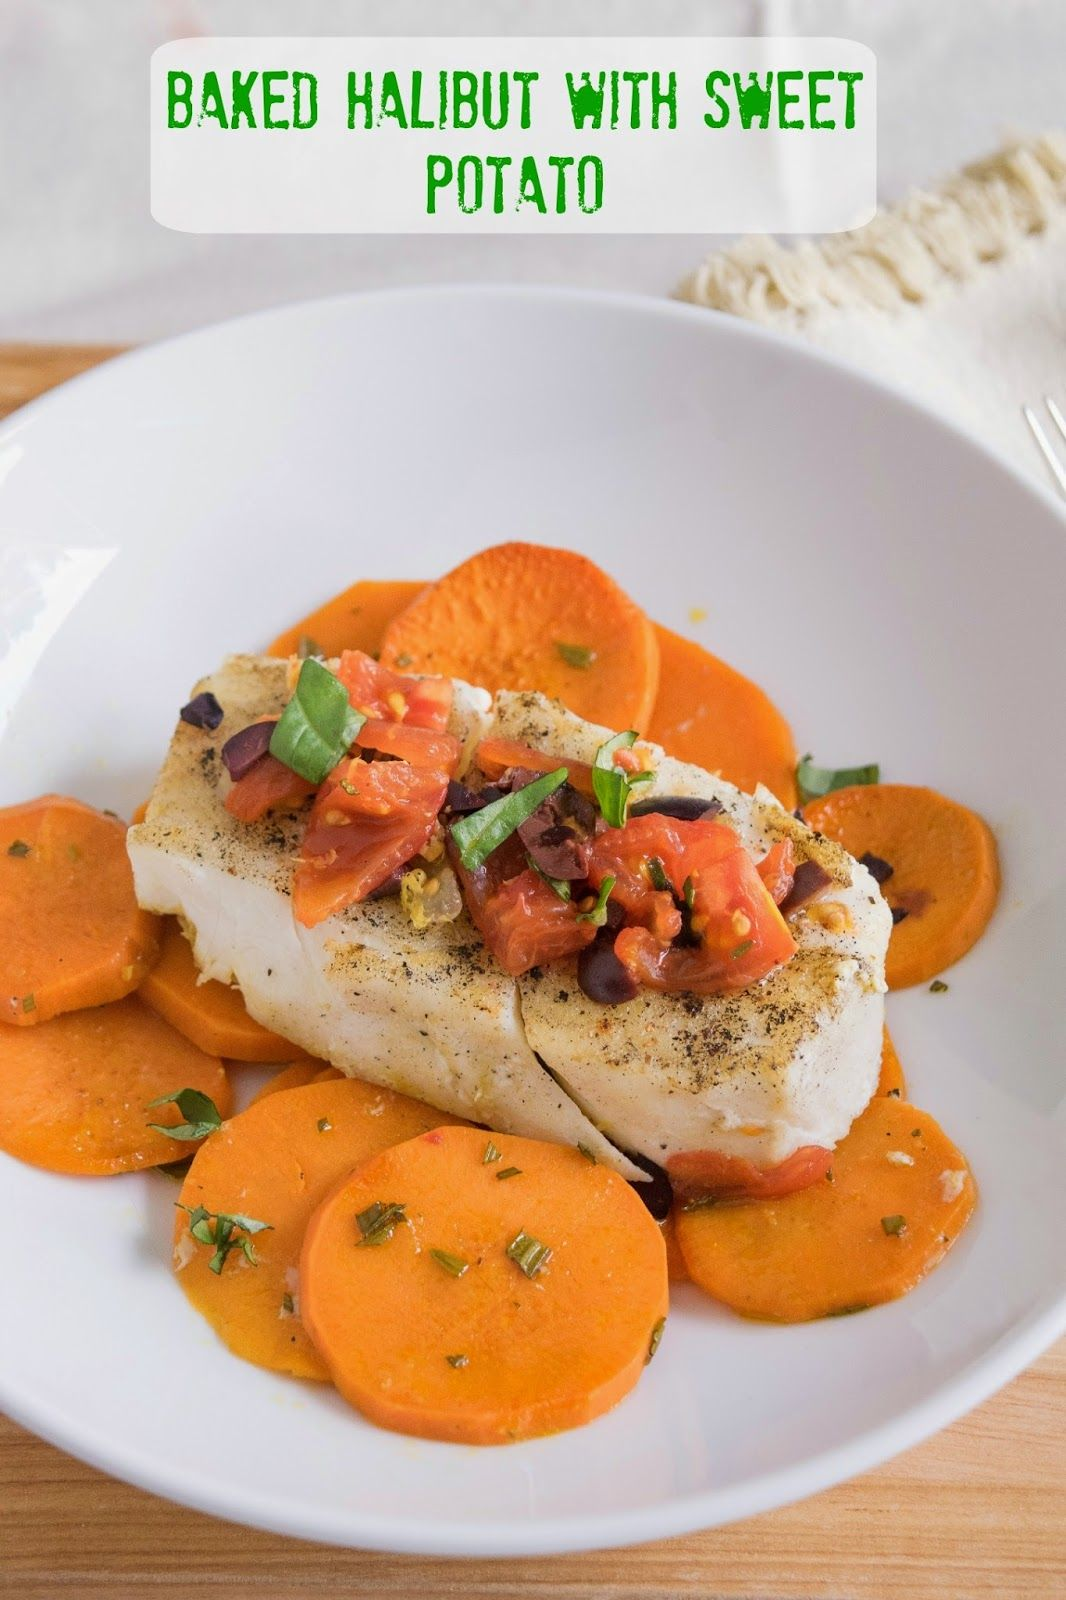 Baked halibut with sweet potato #seafood